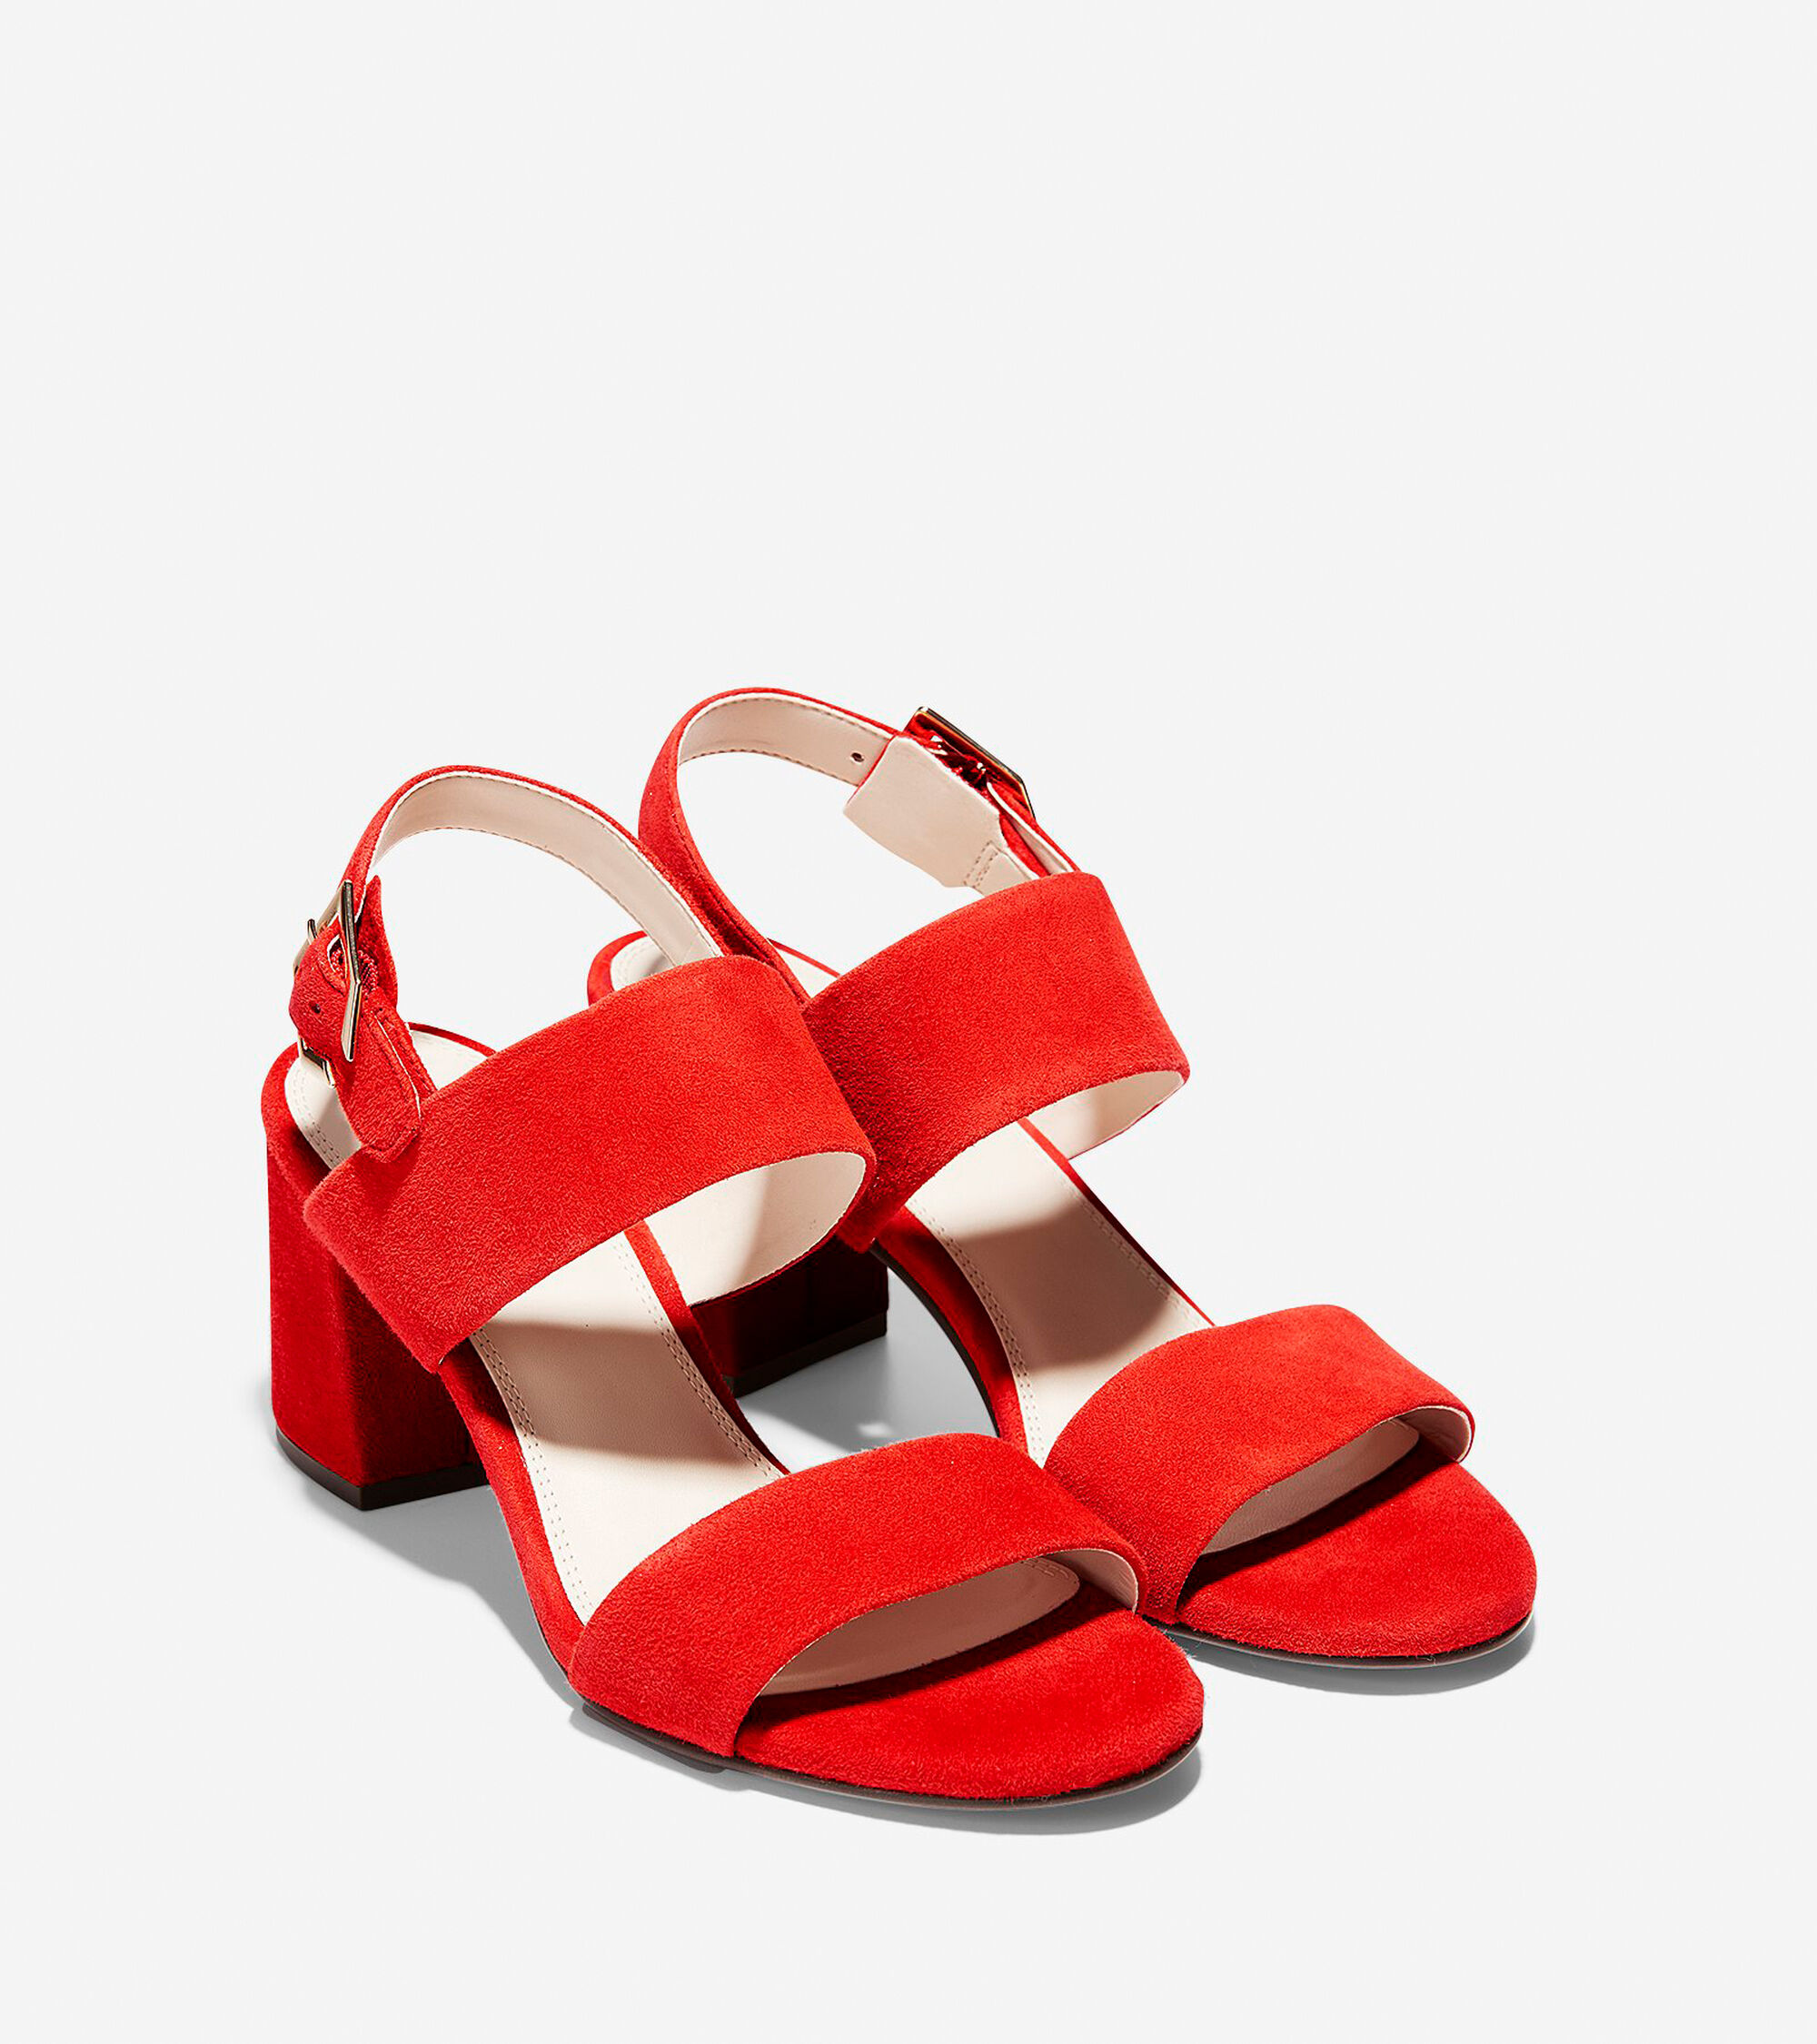 87e3bd313d ... Avani City Sandal (65mm); Avani City Sandal (65mm); Avani City Sandal  (65mm). @COLEHAAN